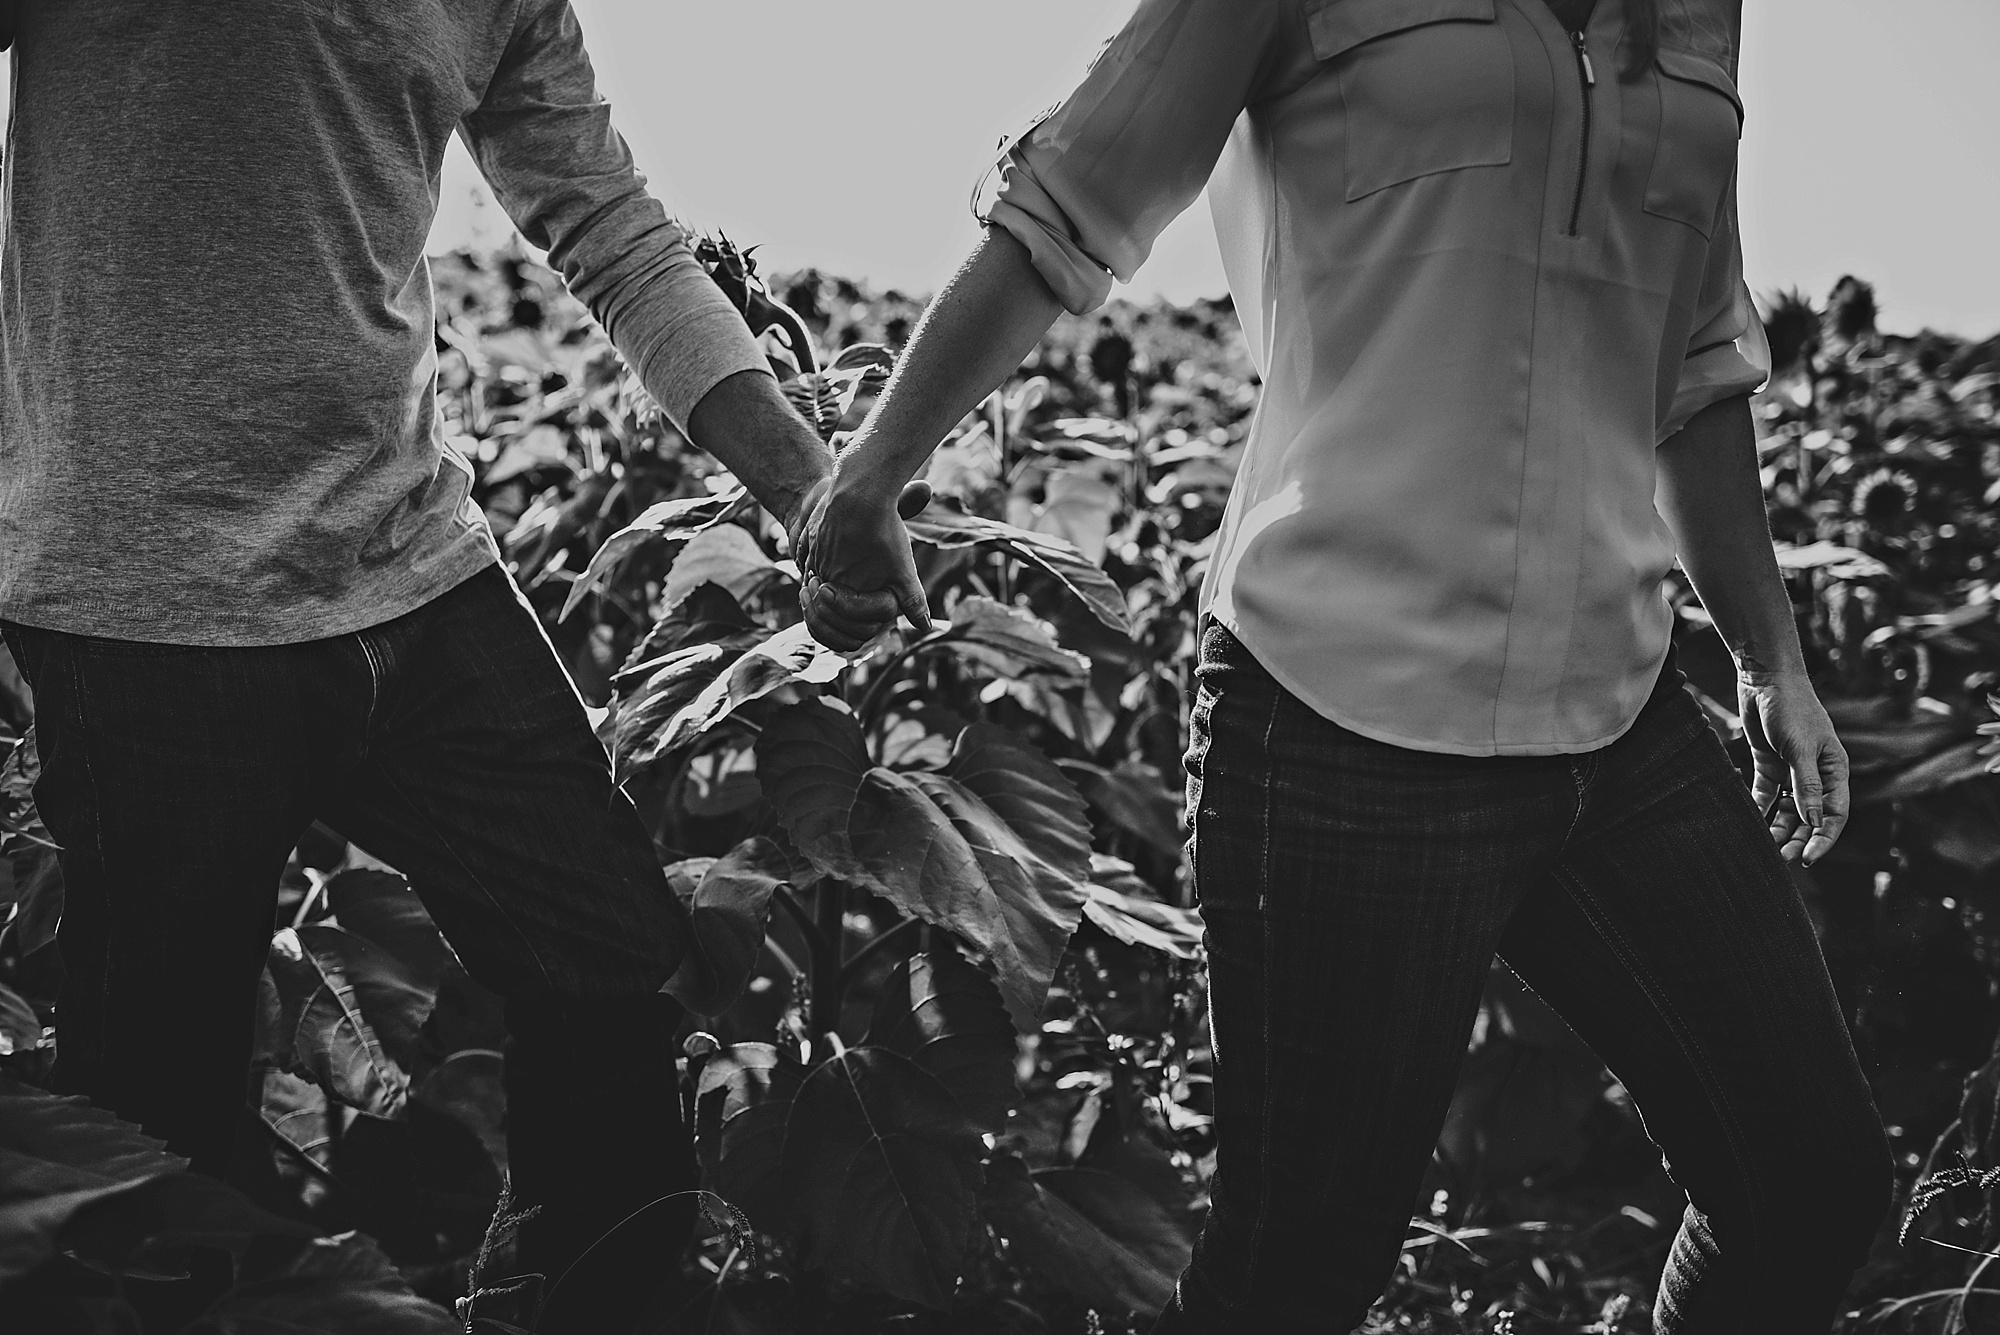 Lori-and-mike-akron-ohio-photographer-lauren-grayson-sunflower-field-session_0011.jpg